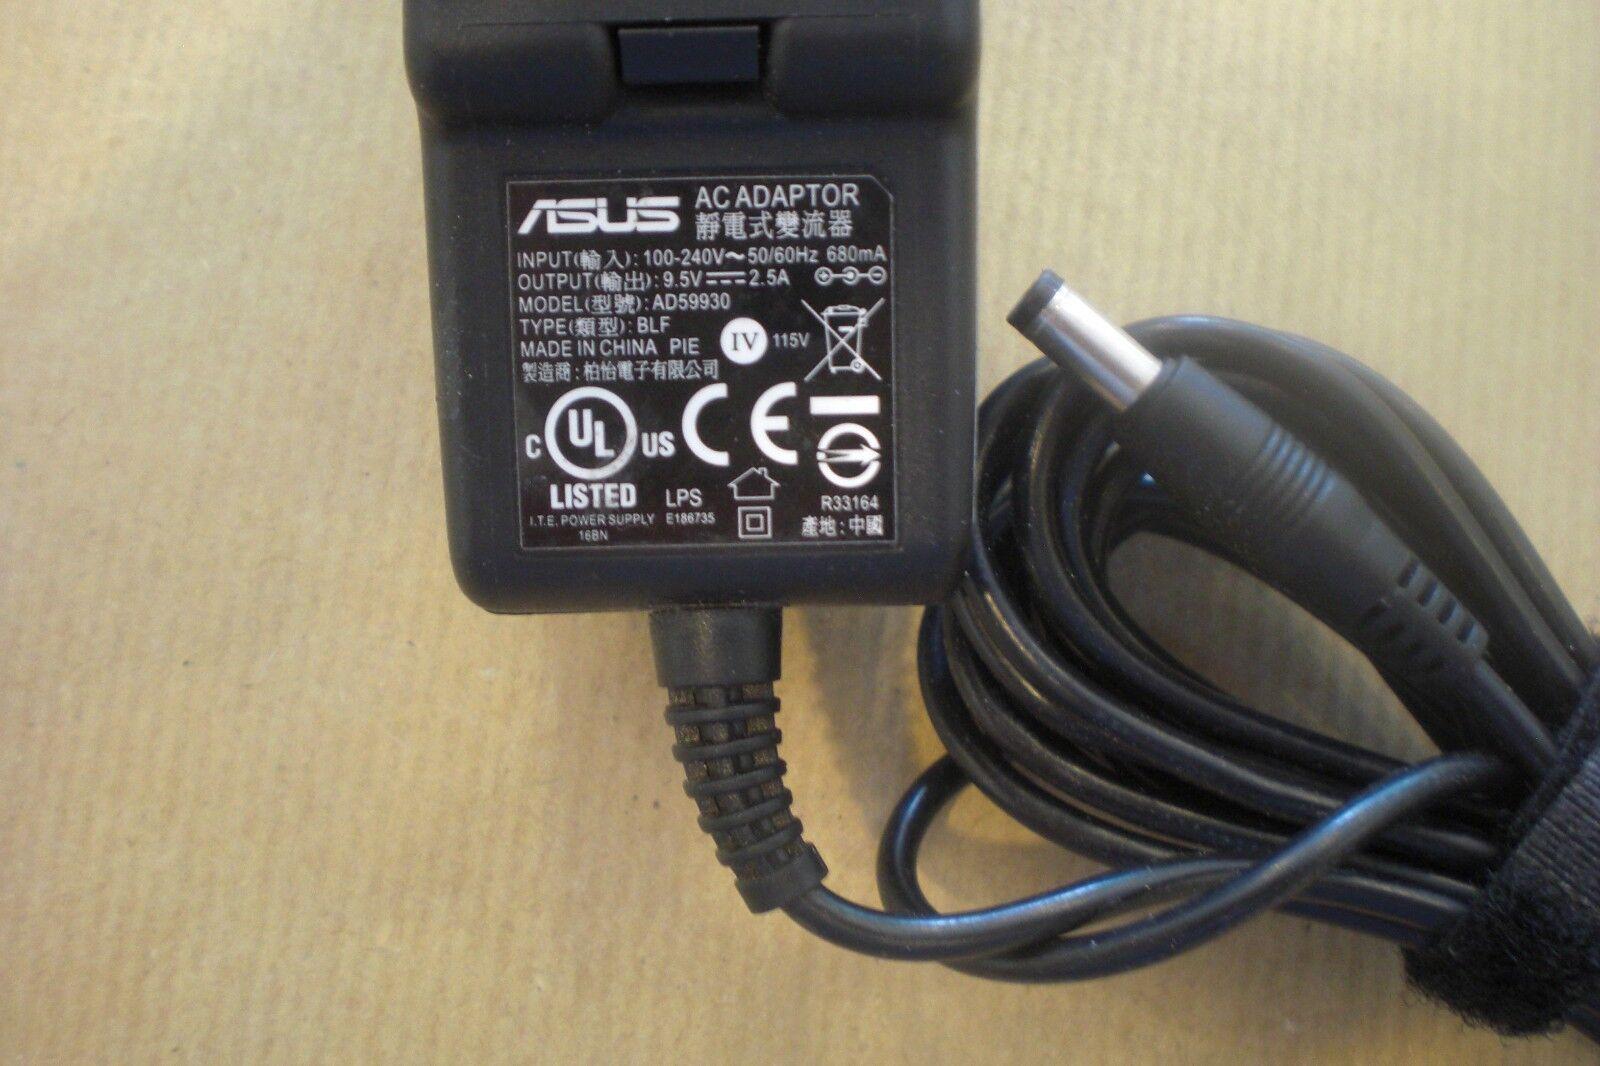 Asus AC Adapter 9.5V 2.5A Modell: AD59930 ASUS NETBOOK LADEGERÄT             #71